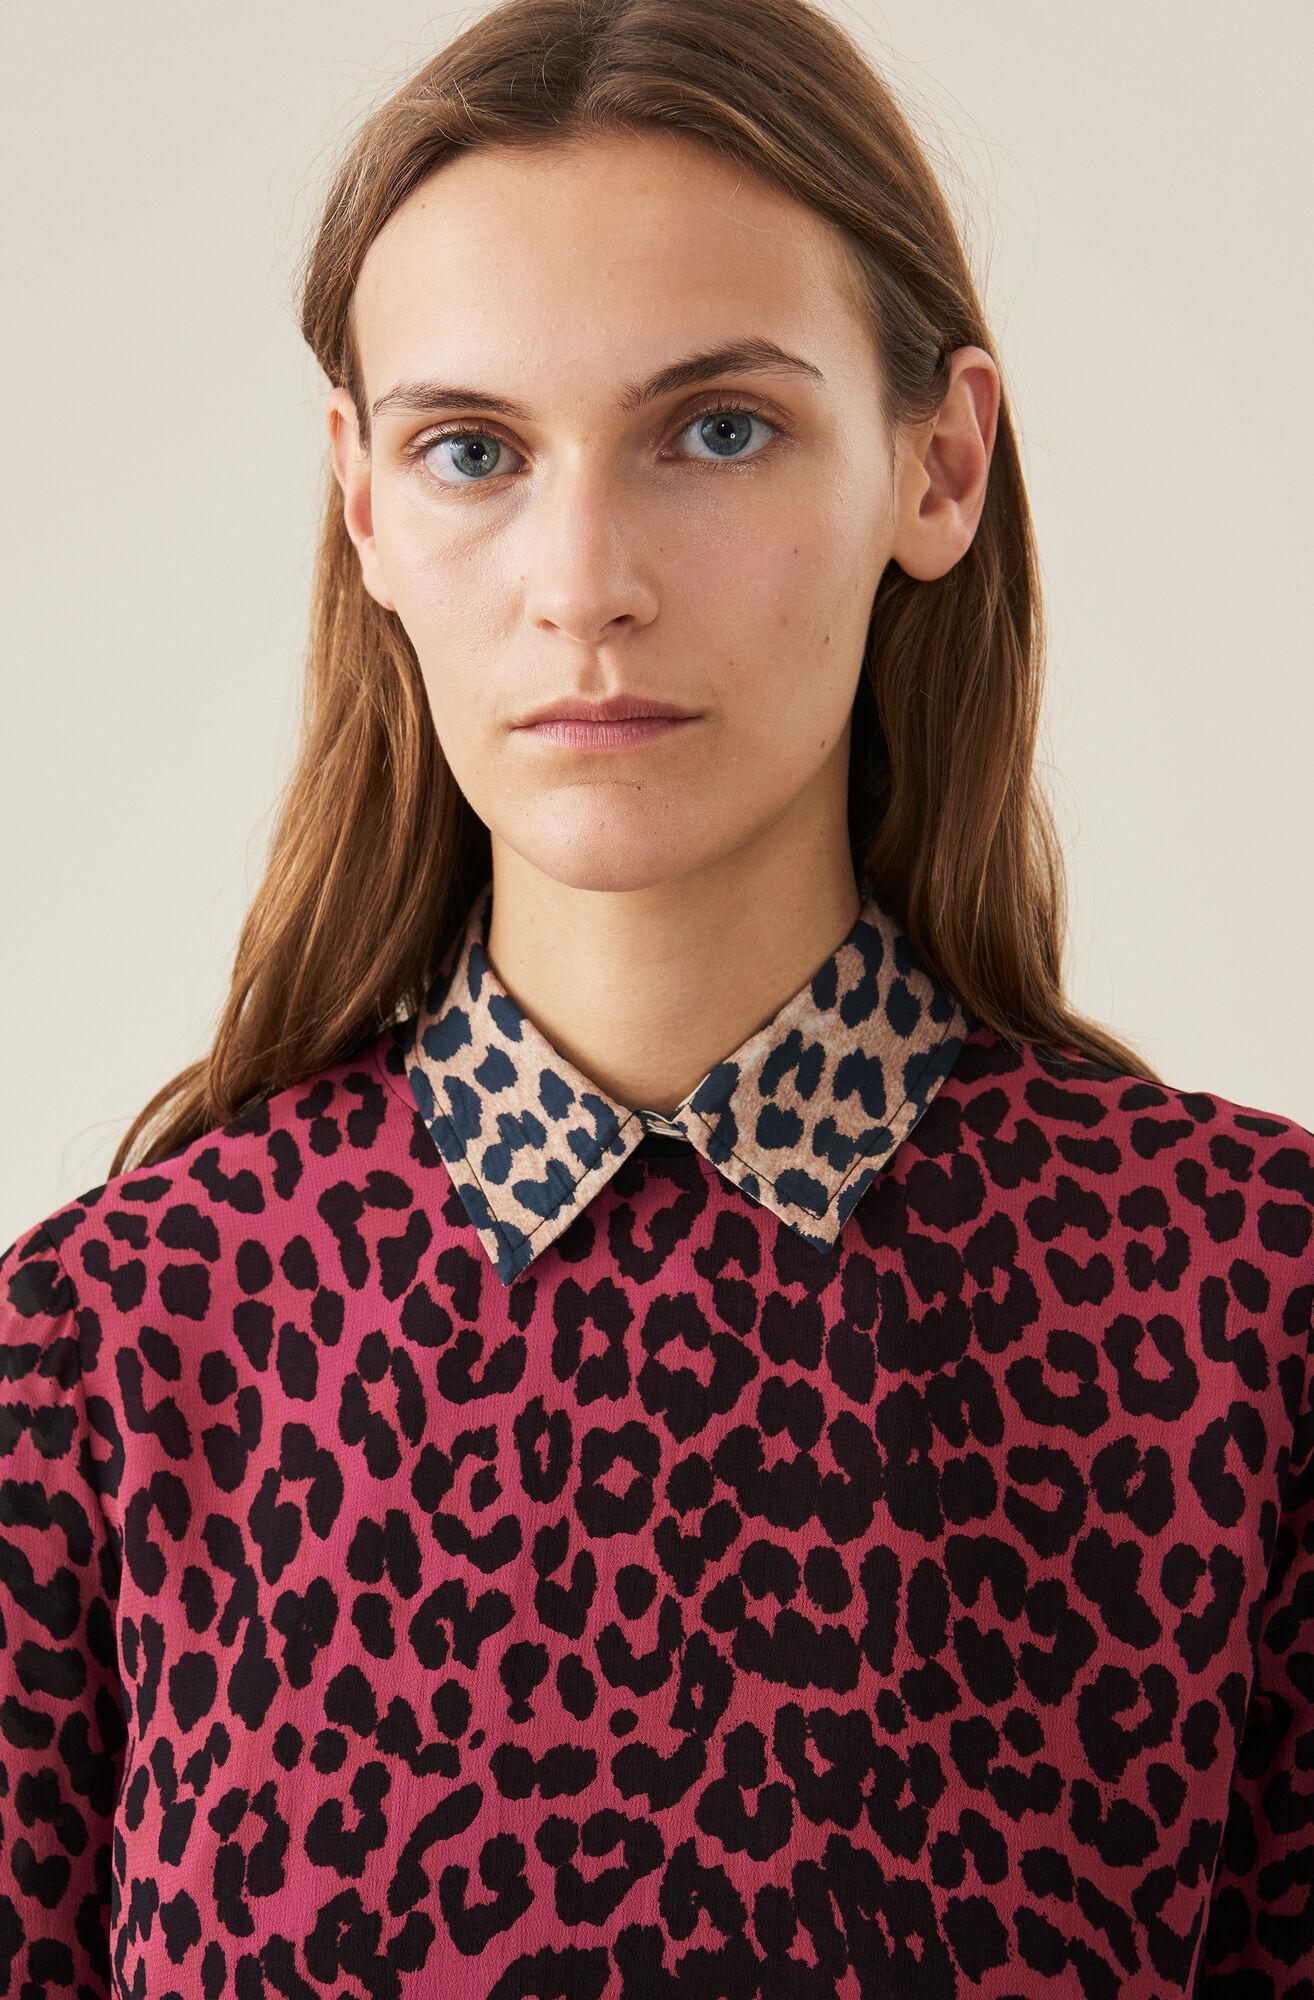 Carnivora Leopard Love for Leopard Mini Dress, Hot Pink, hi-res